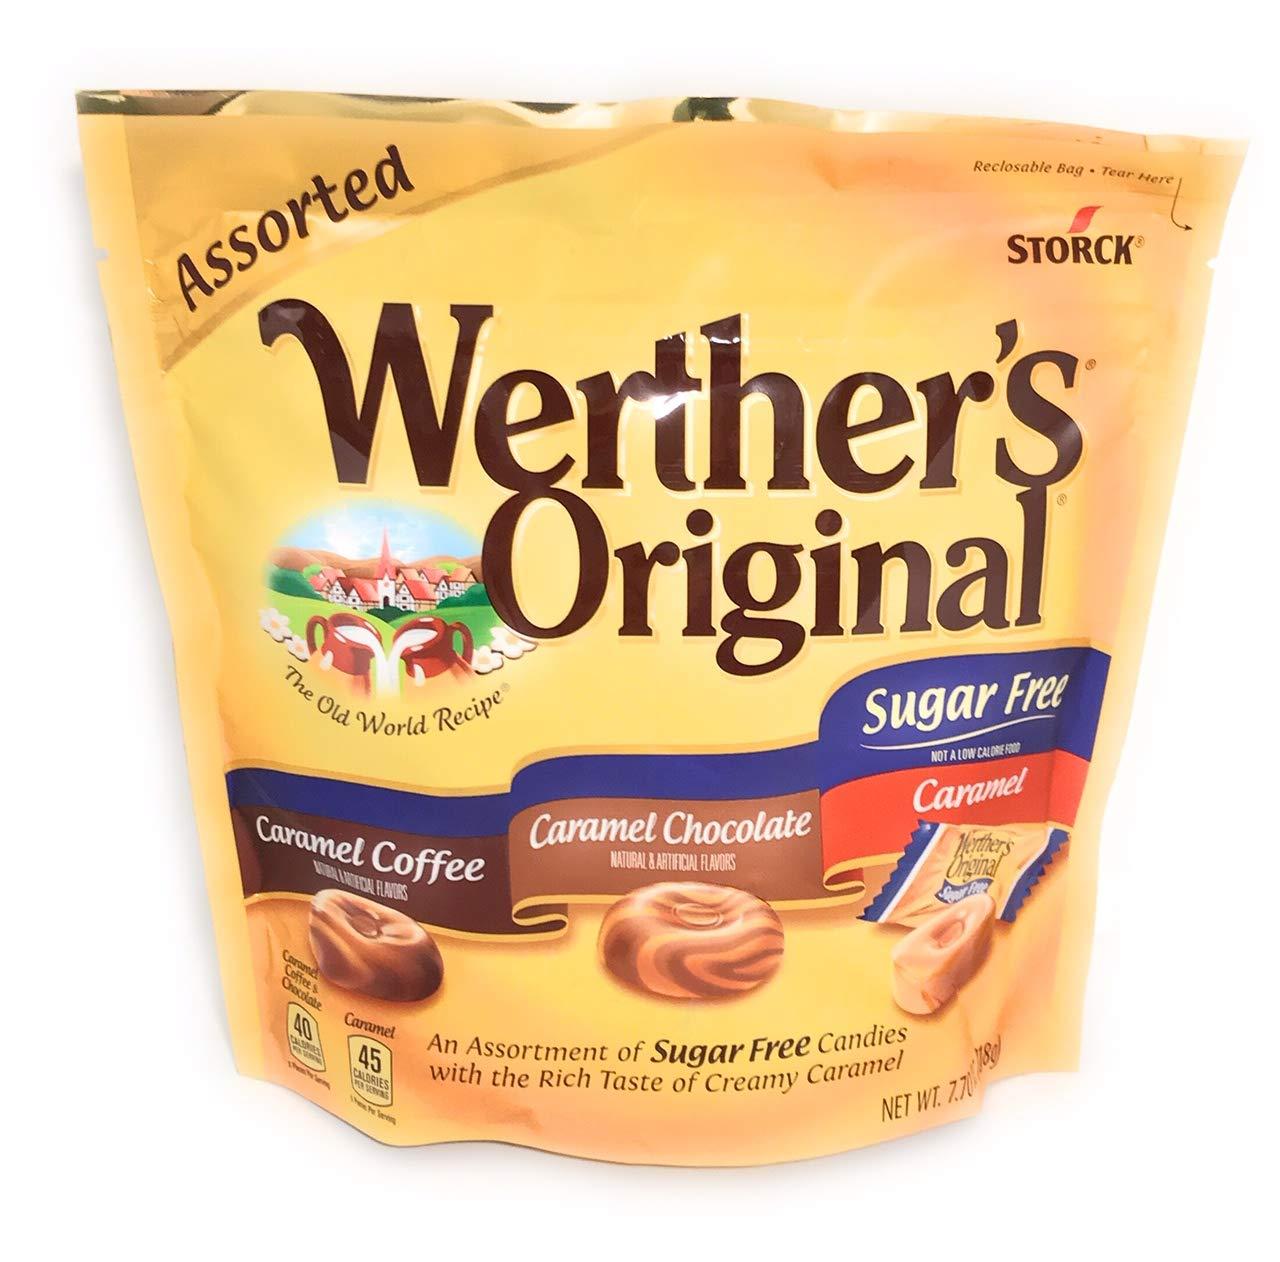 Werther's Original Sugar Free Assorted 7.7oz. Caramel Coffee, Caramel Chocolate, Caramel